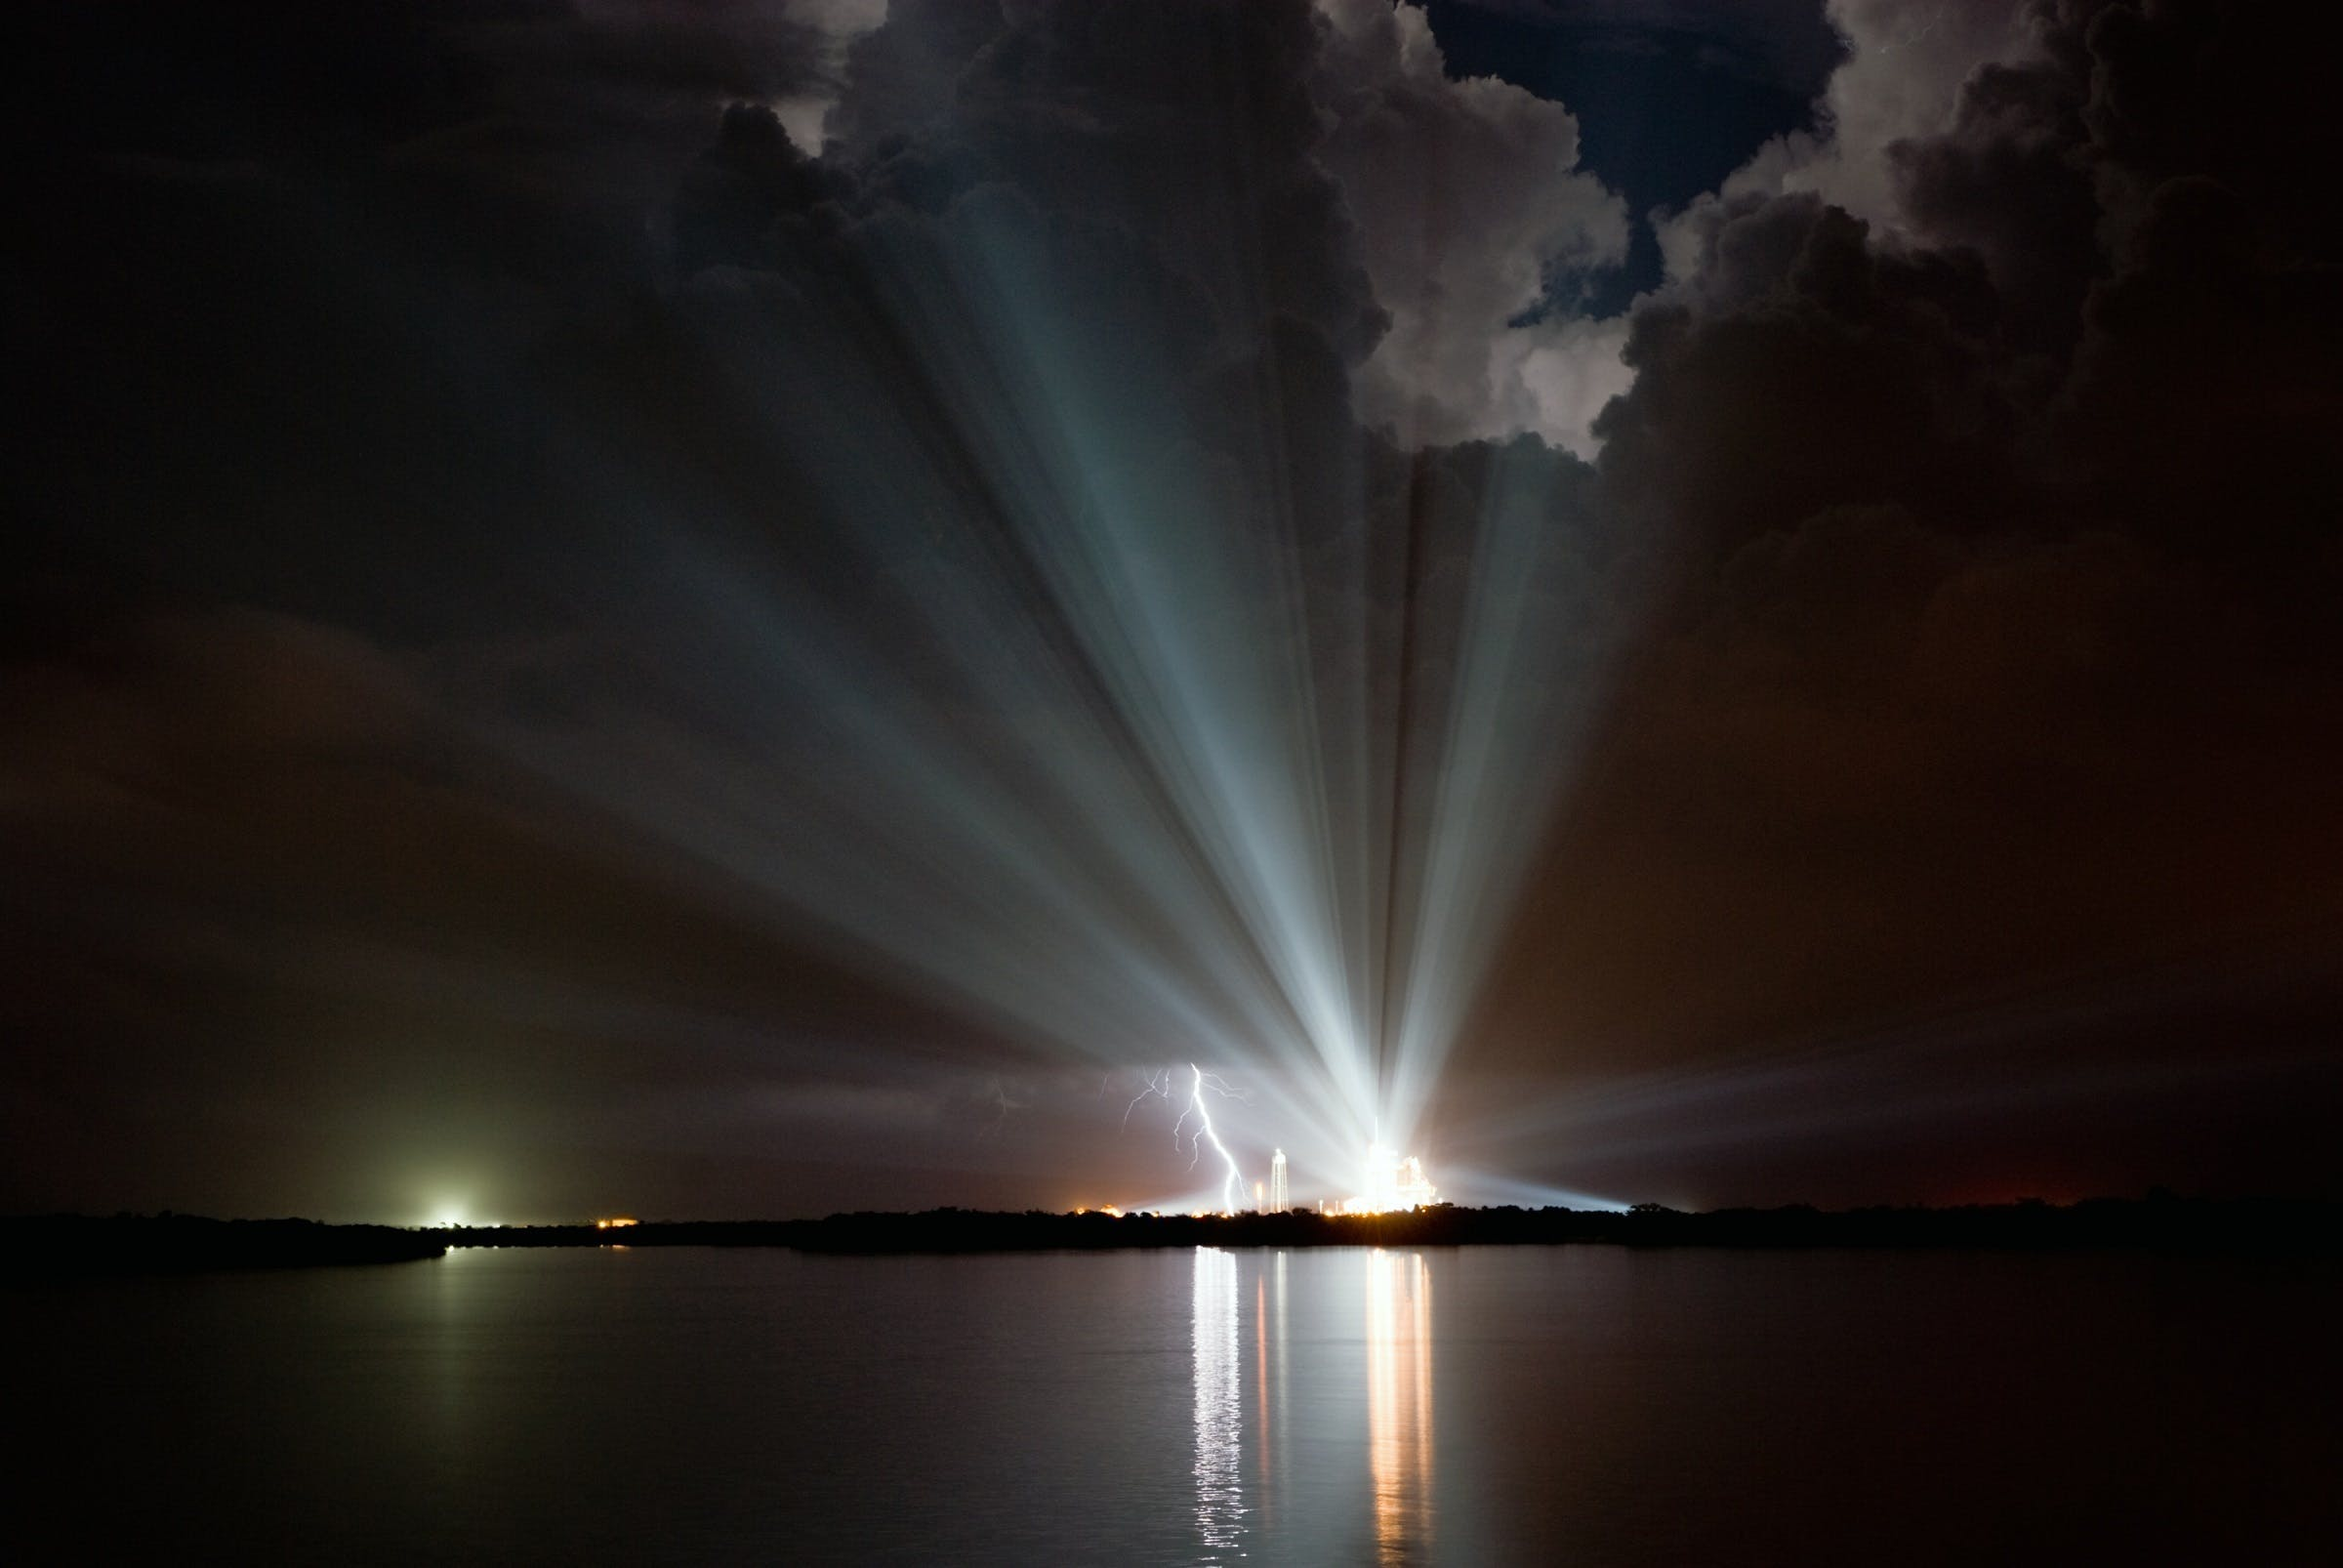 Lightning Struck Photo